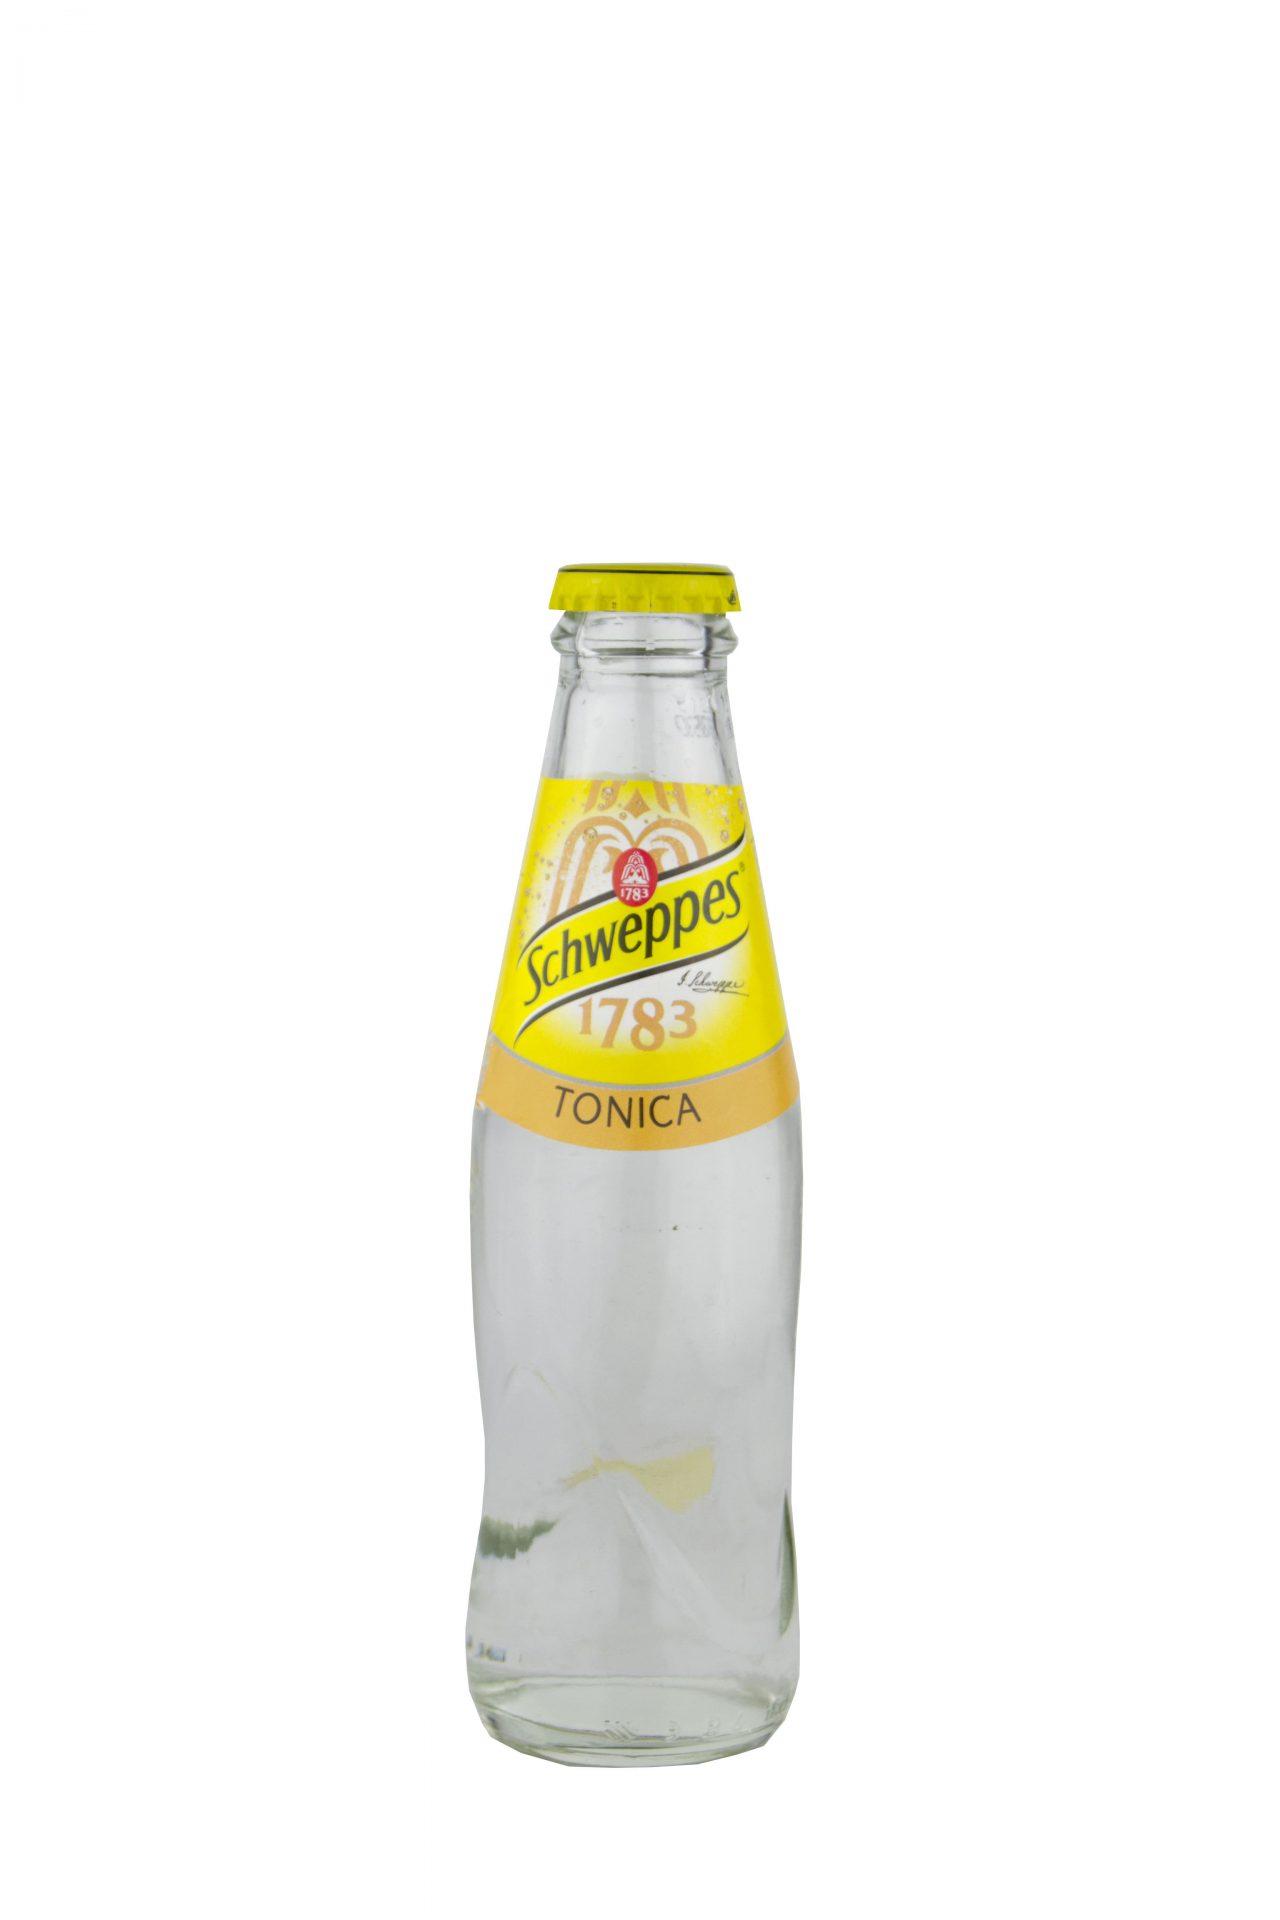 Schweppes – Tonica